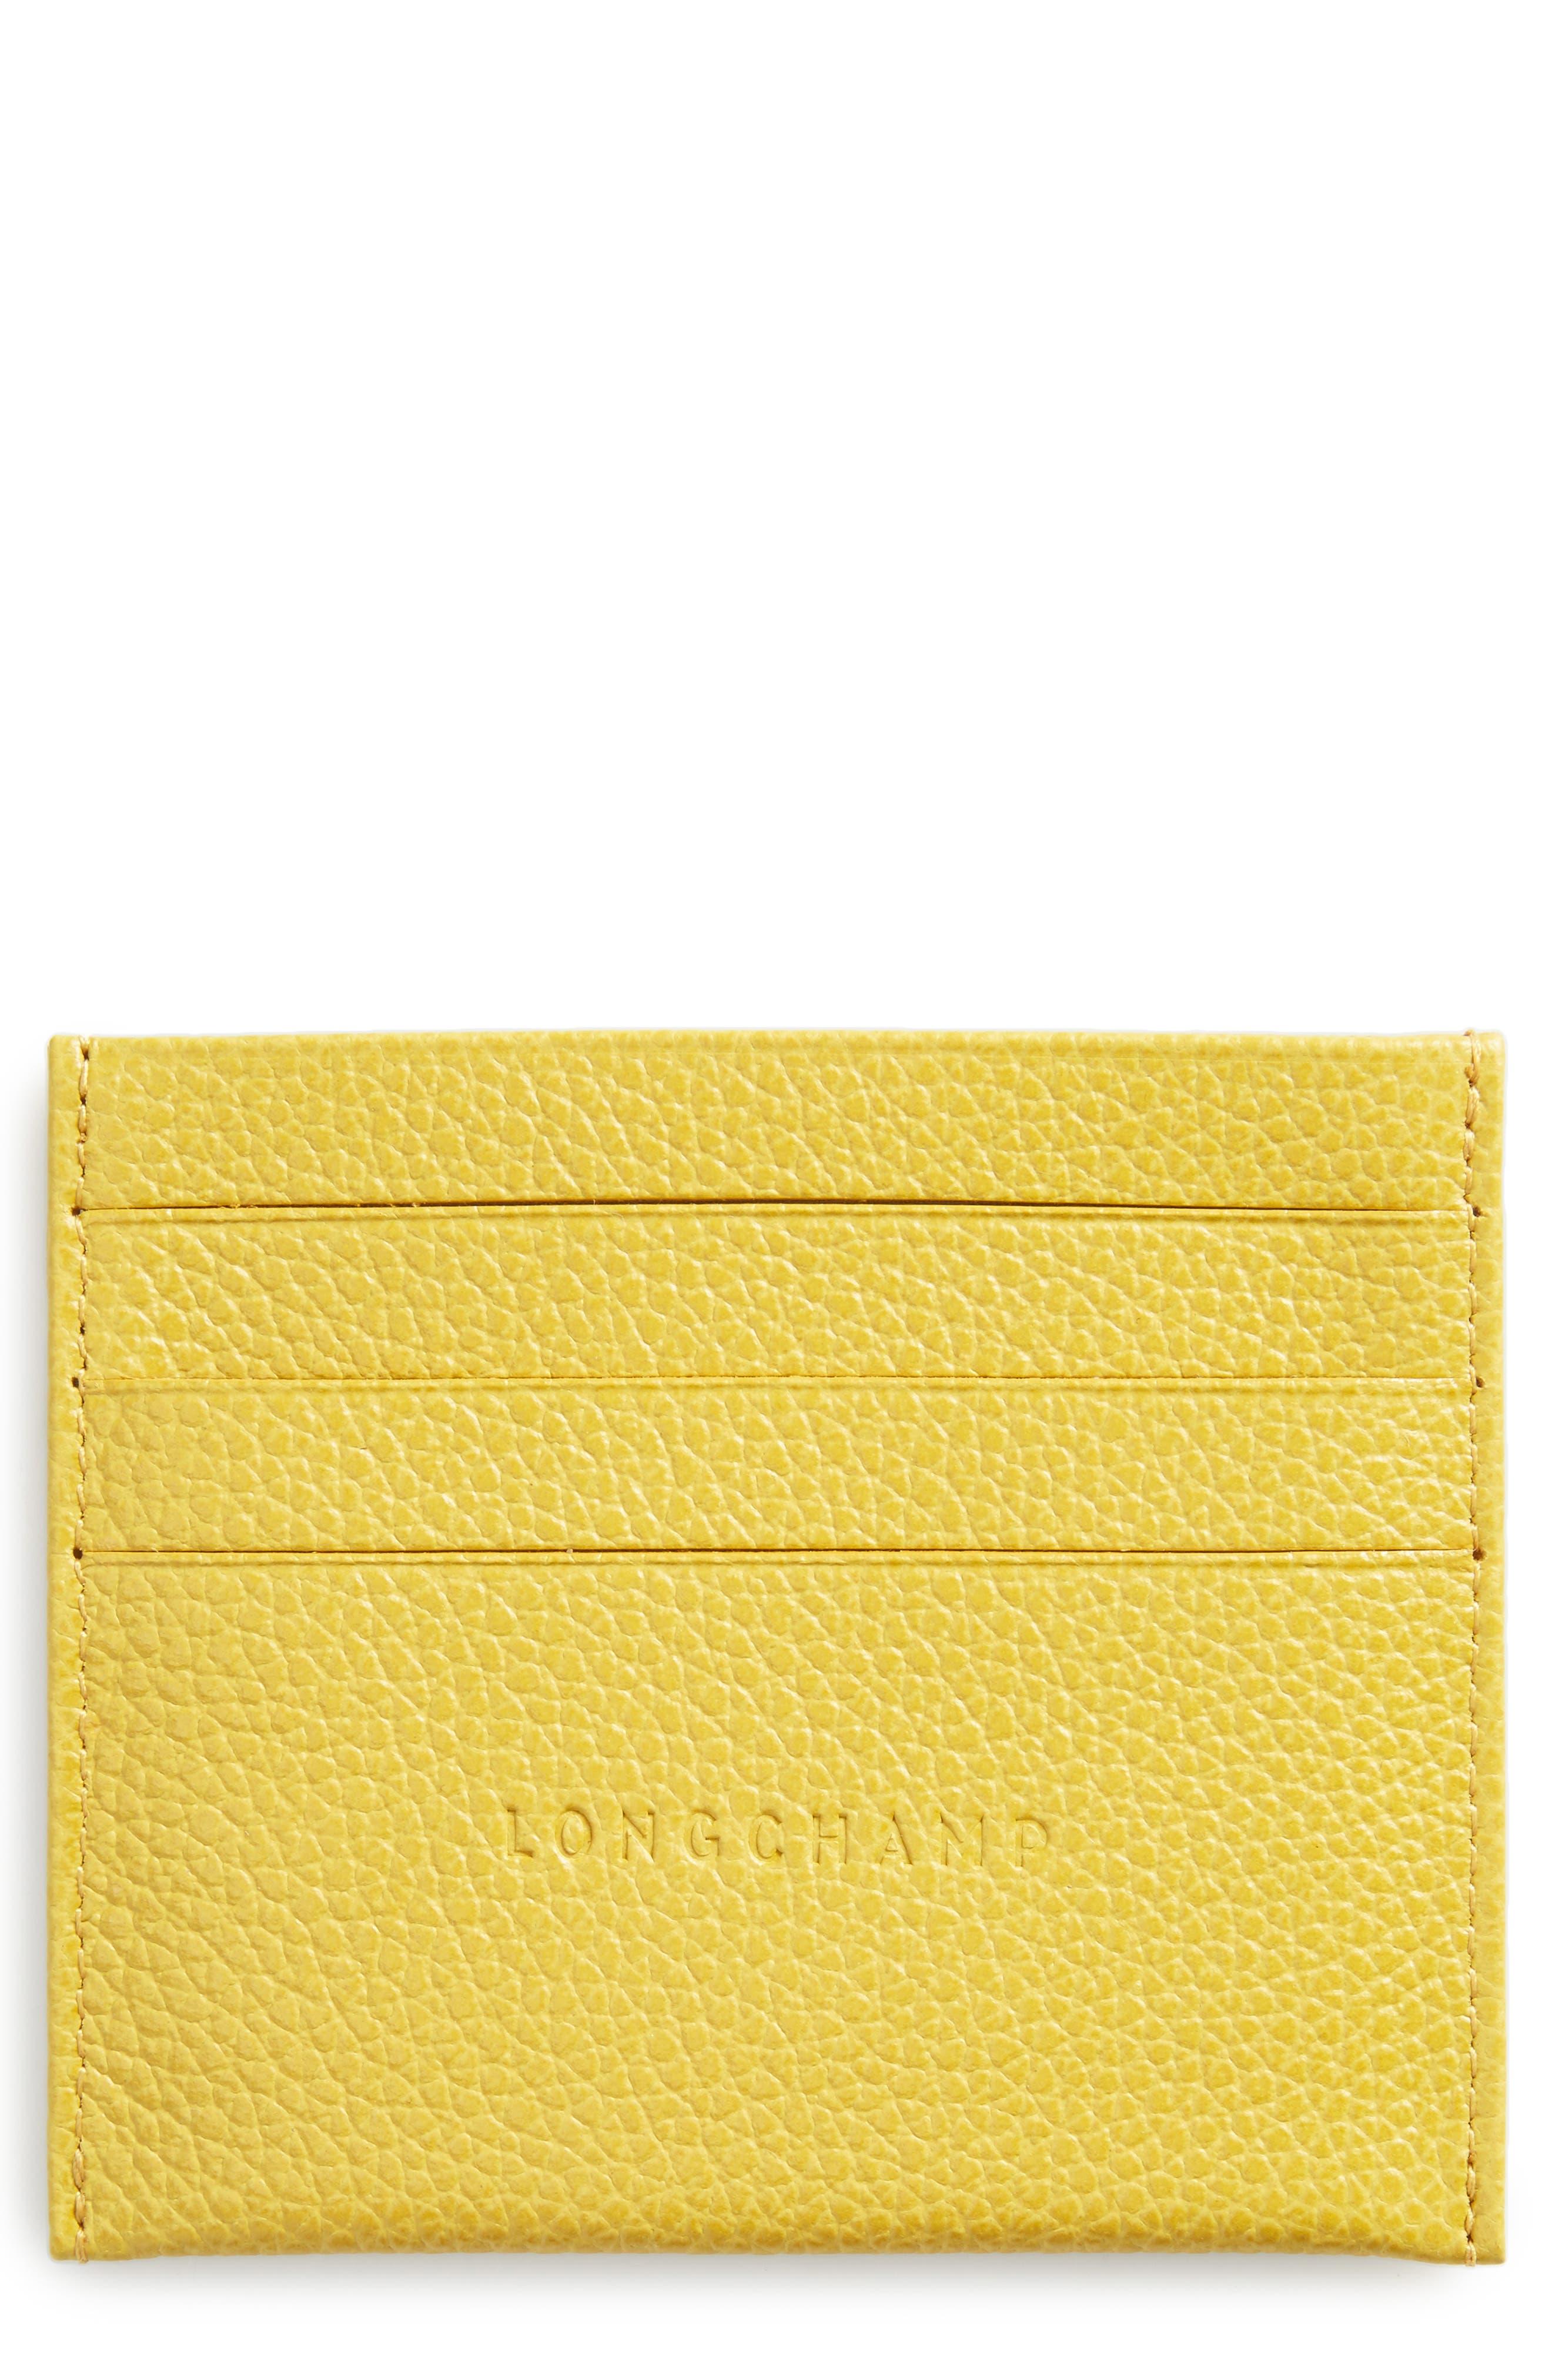 Main Image - Longchamp 'Le Foulonne' Pebbled Leather Card Holder